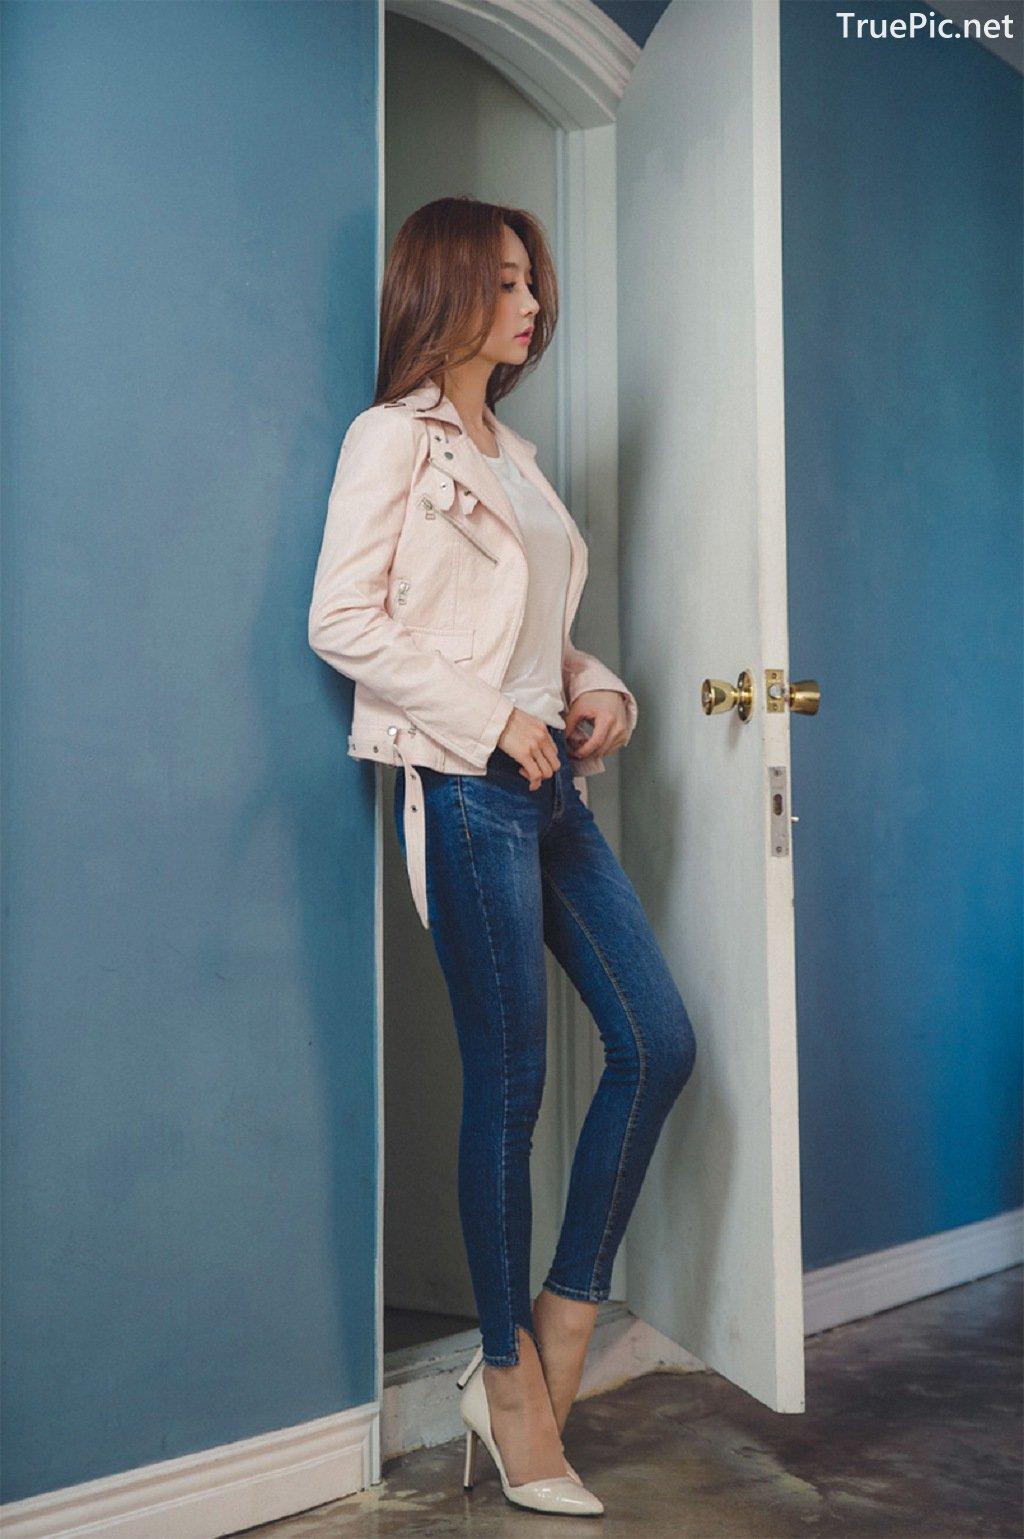 Image-Korean-Fashion-Model–Park-Soo-Yeon–Indoor-Photoshoot-Collection-TruePic.nett- Picture-6